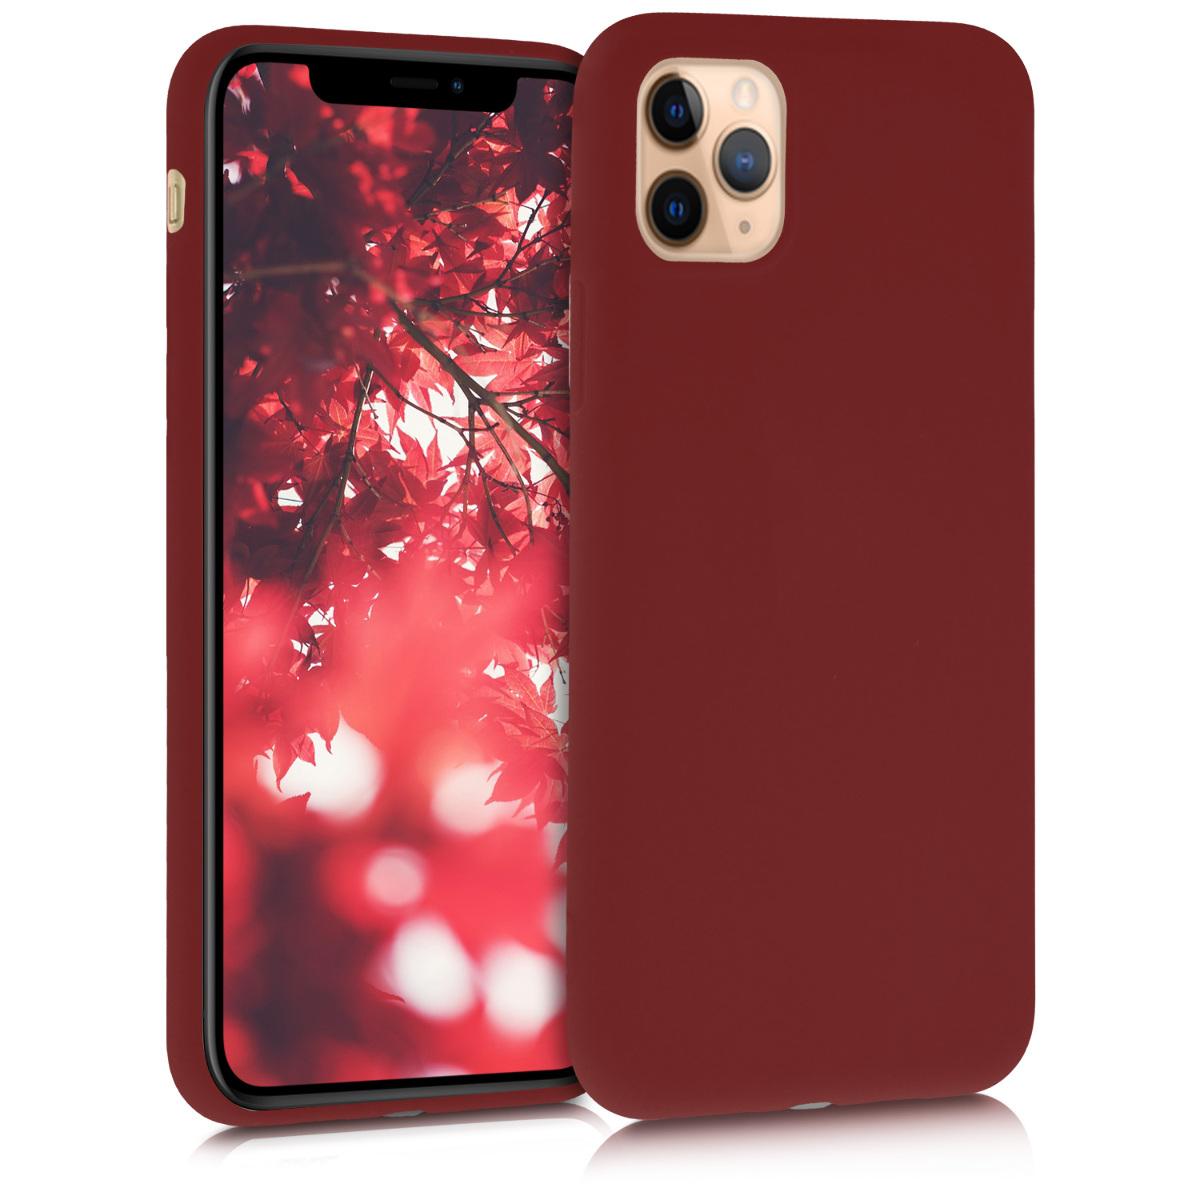 KW Θήκη Σιλικόνης iPhone 11 Pro - Red Matte (49788.09)